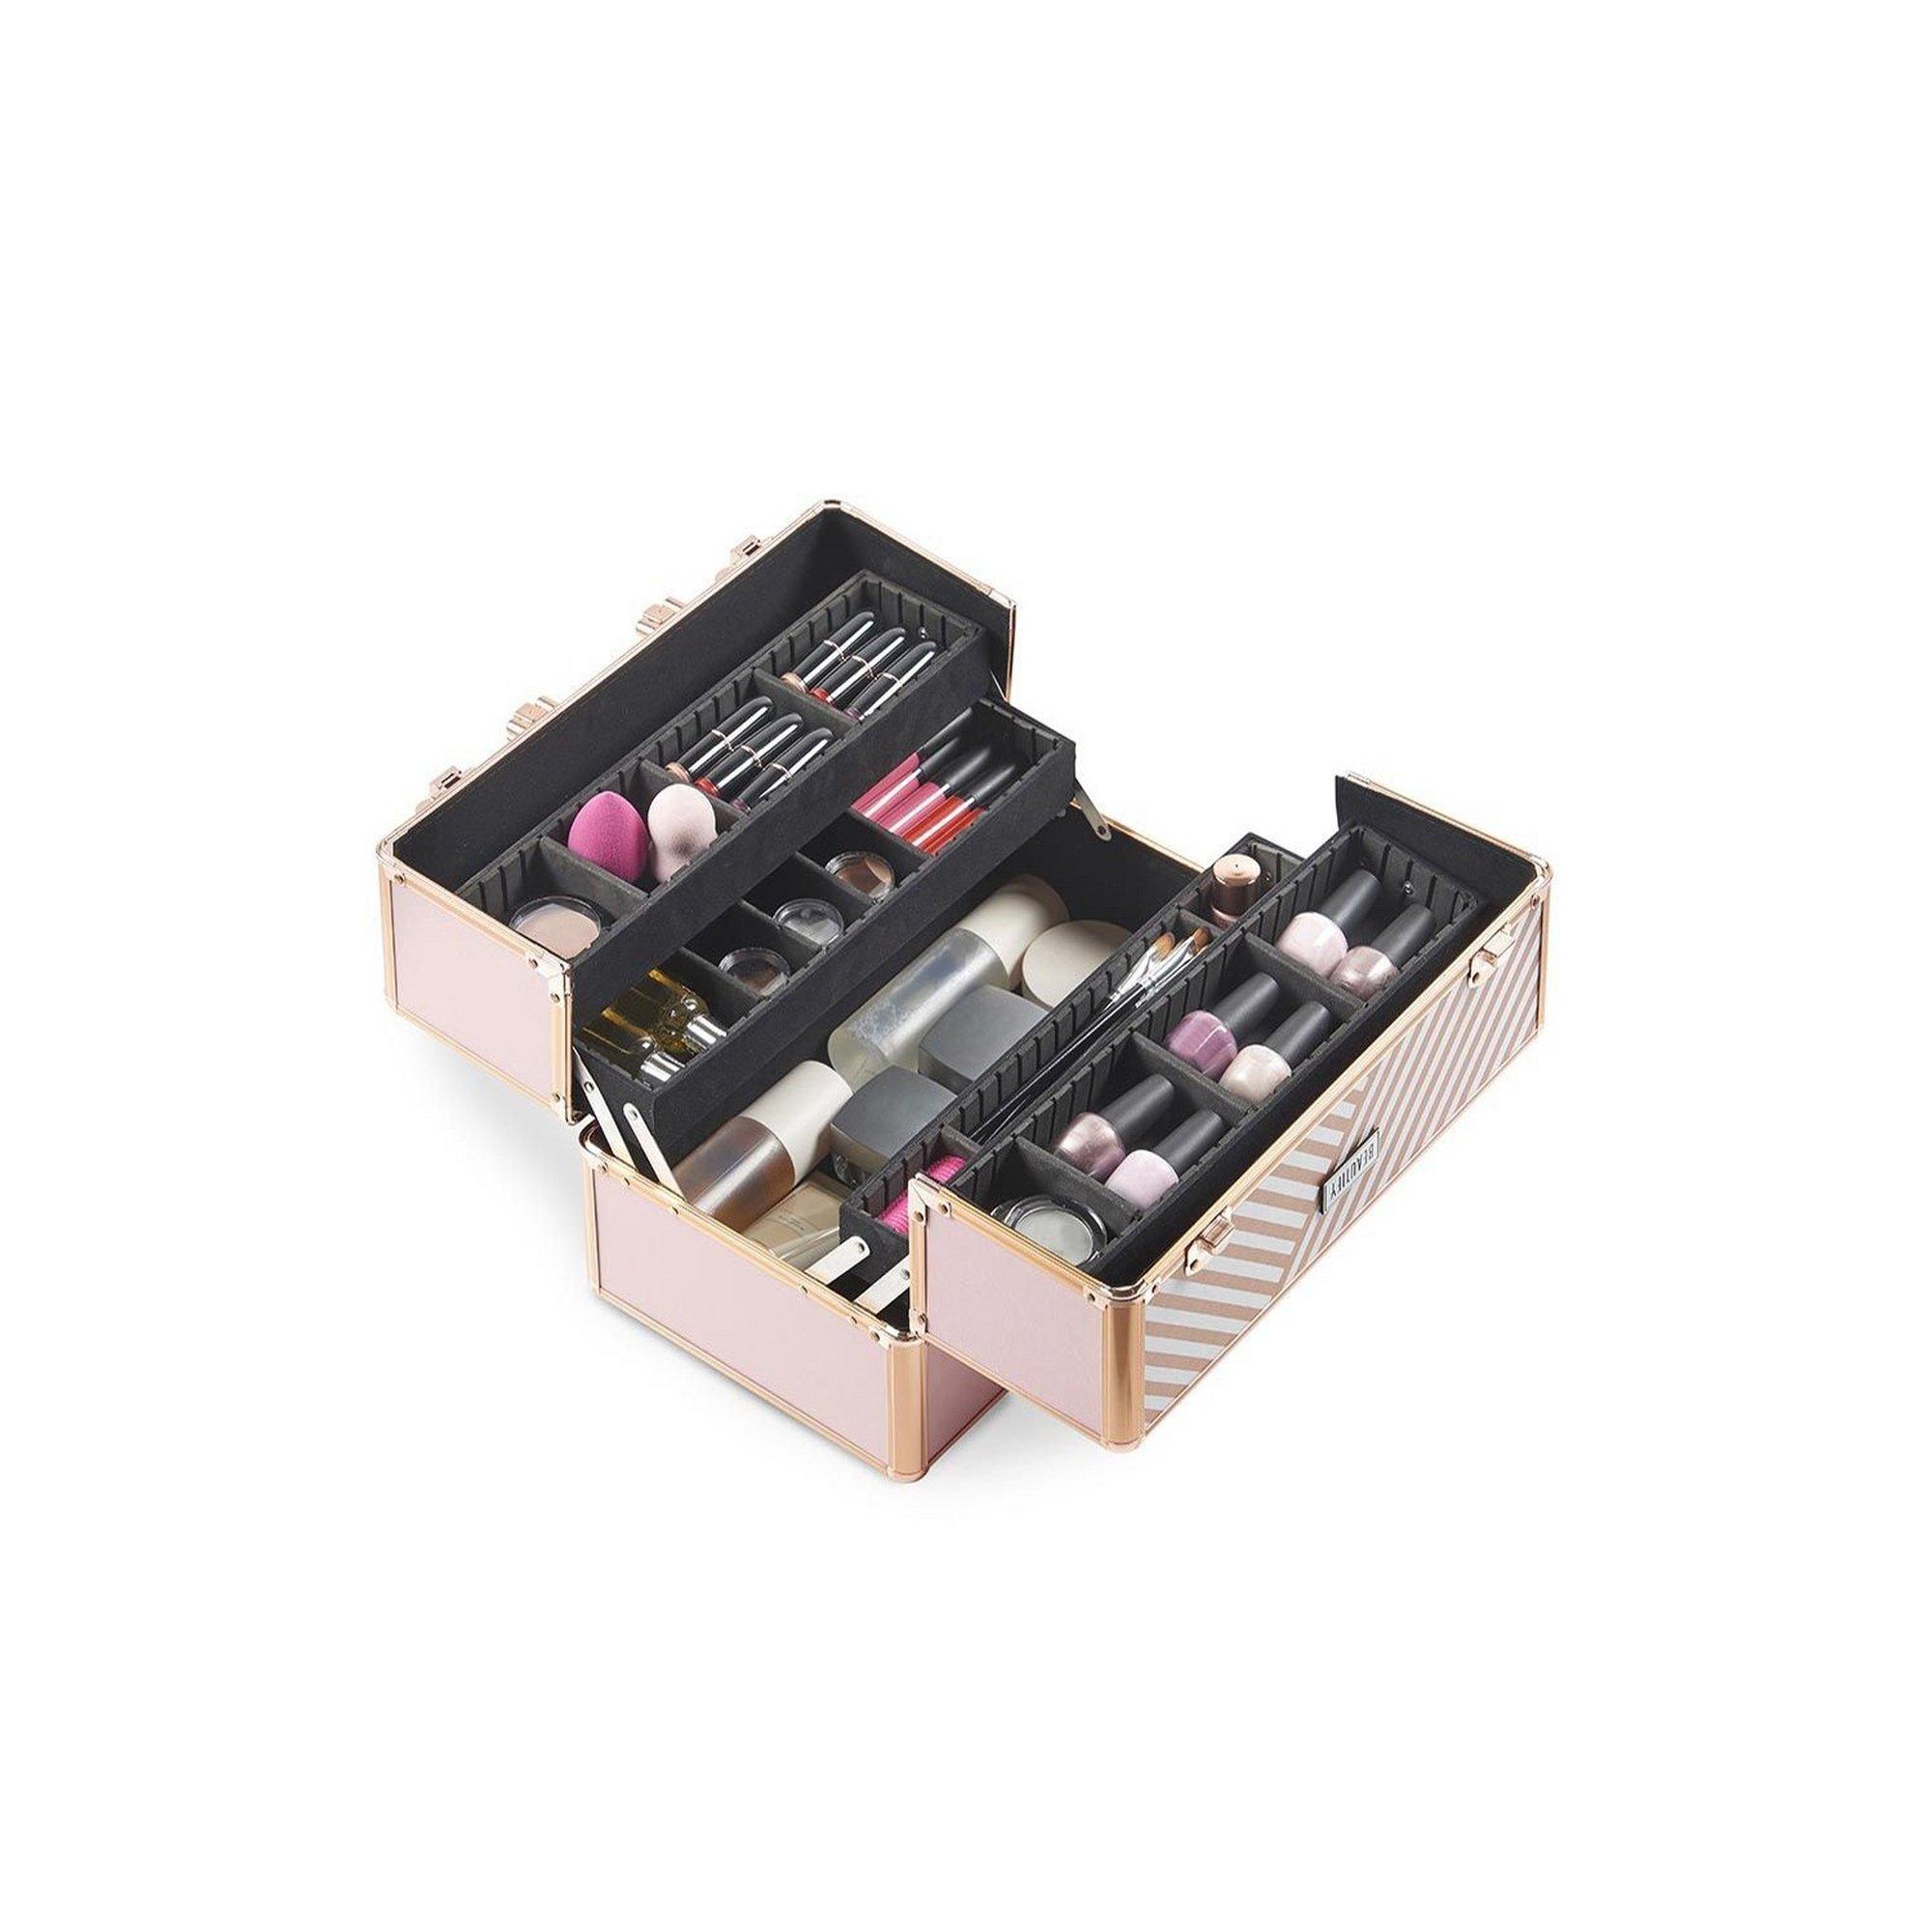 Image of Beautify Large Blush Pink Make Up Case